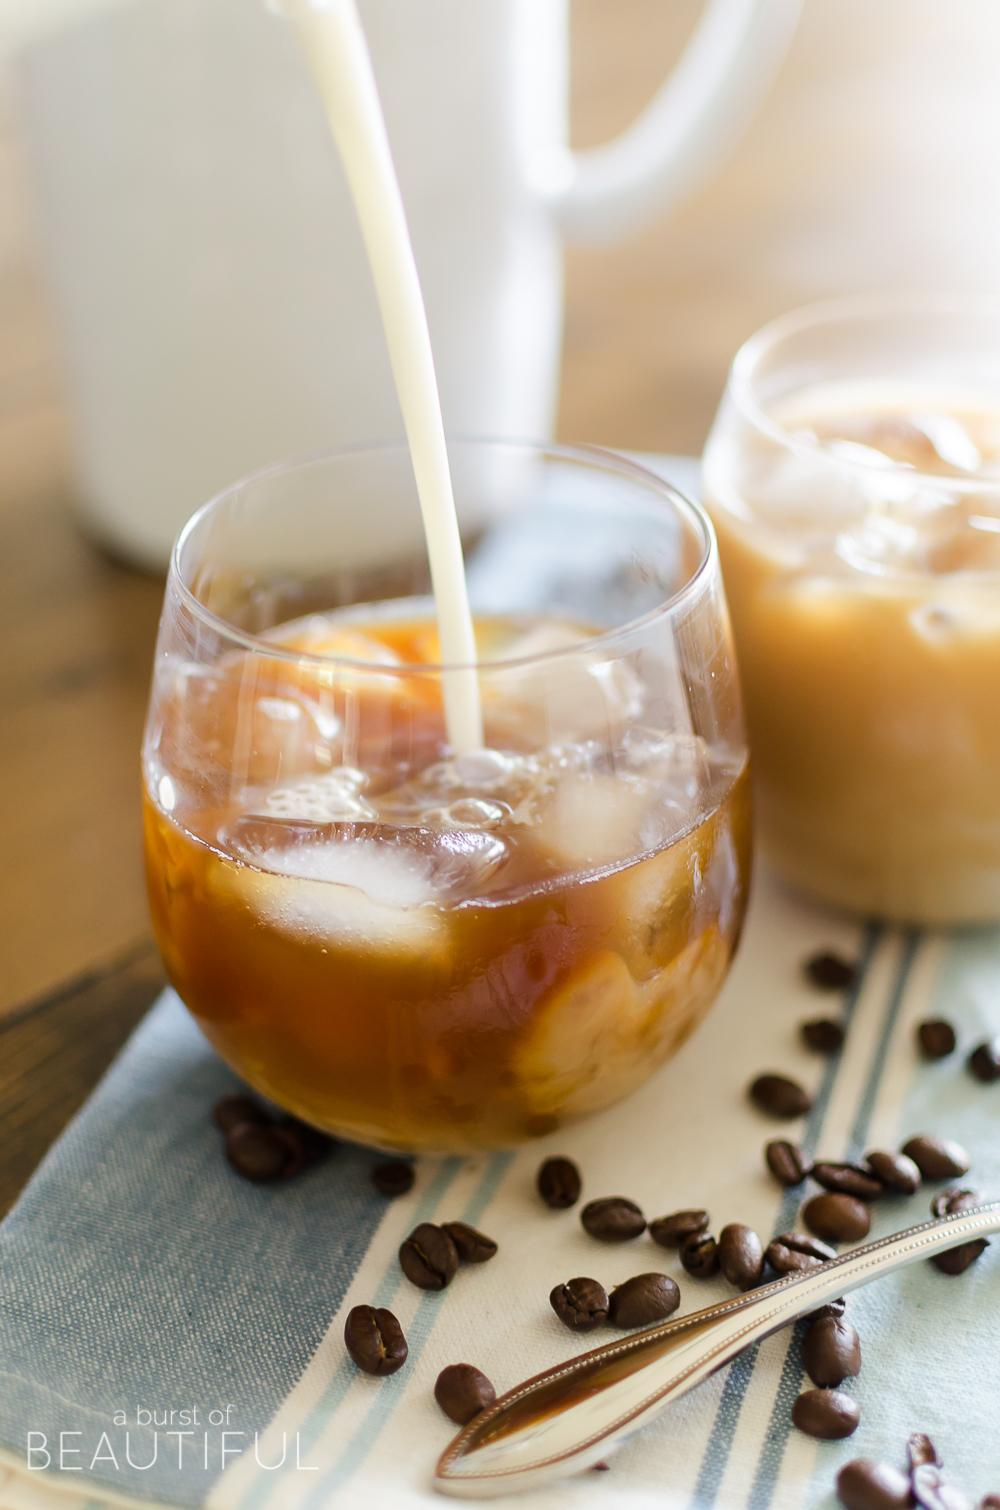 The Best Vanilla Hazelnut Iced Coffee